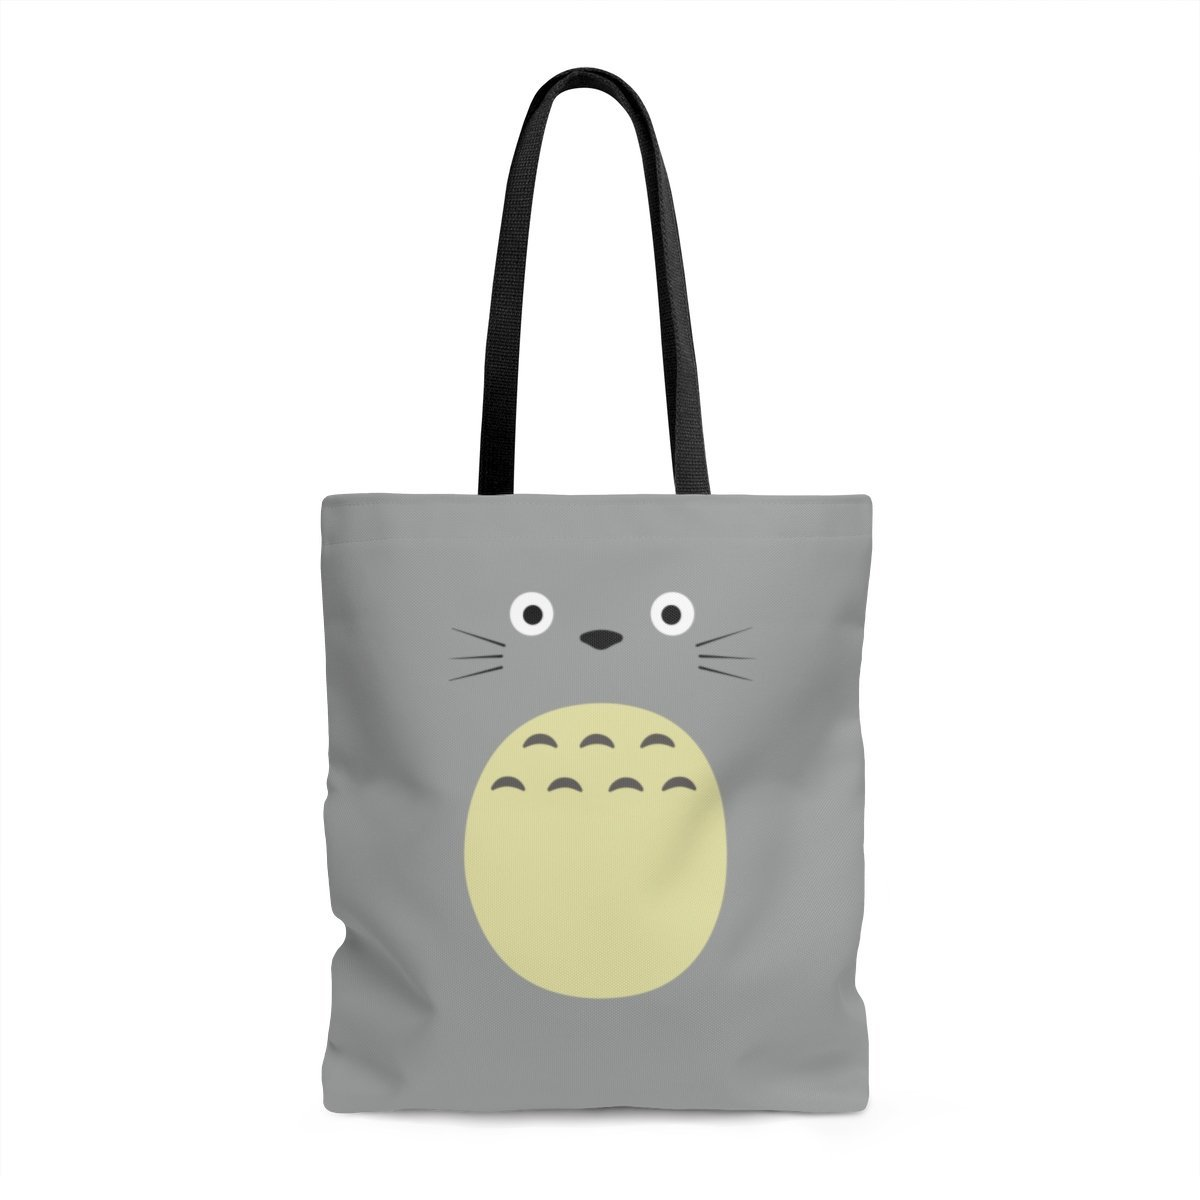 Totoro | My Neighbor Totoro Studio Ghibli Fans Inspired Tote Bag